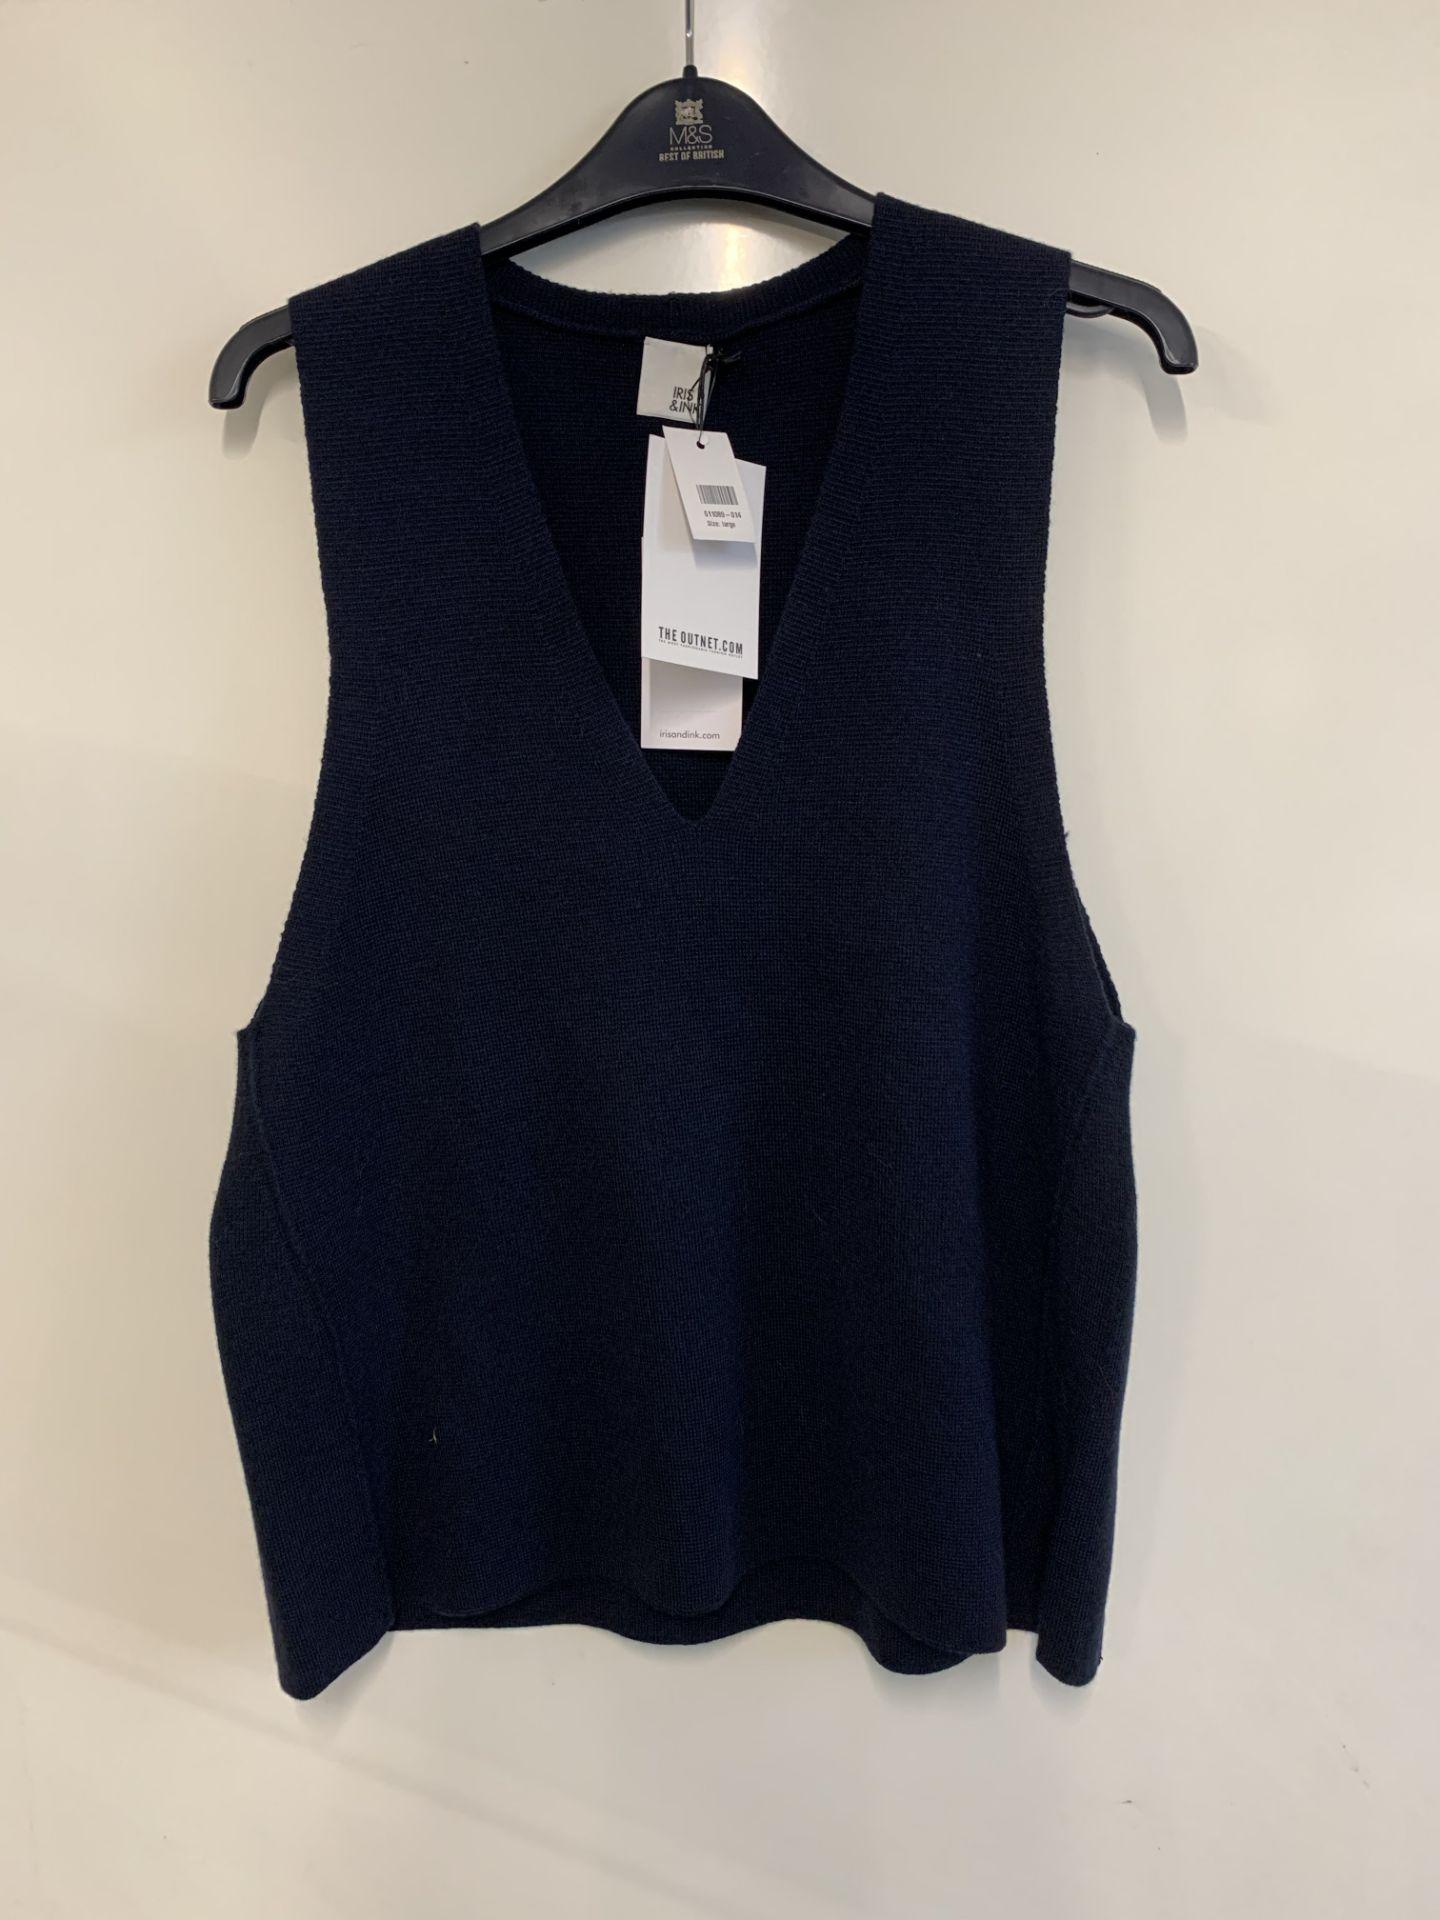 Lot 58 - Iris & Ink women's Lucia Milano Wool Tank | RRP £25.00